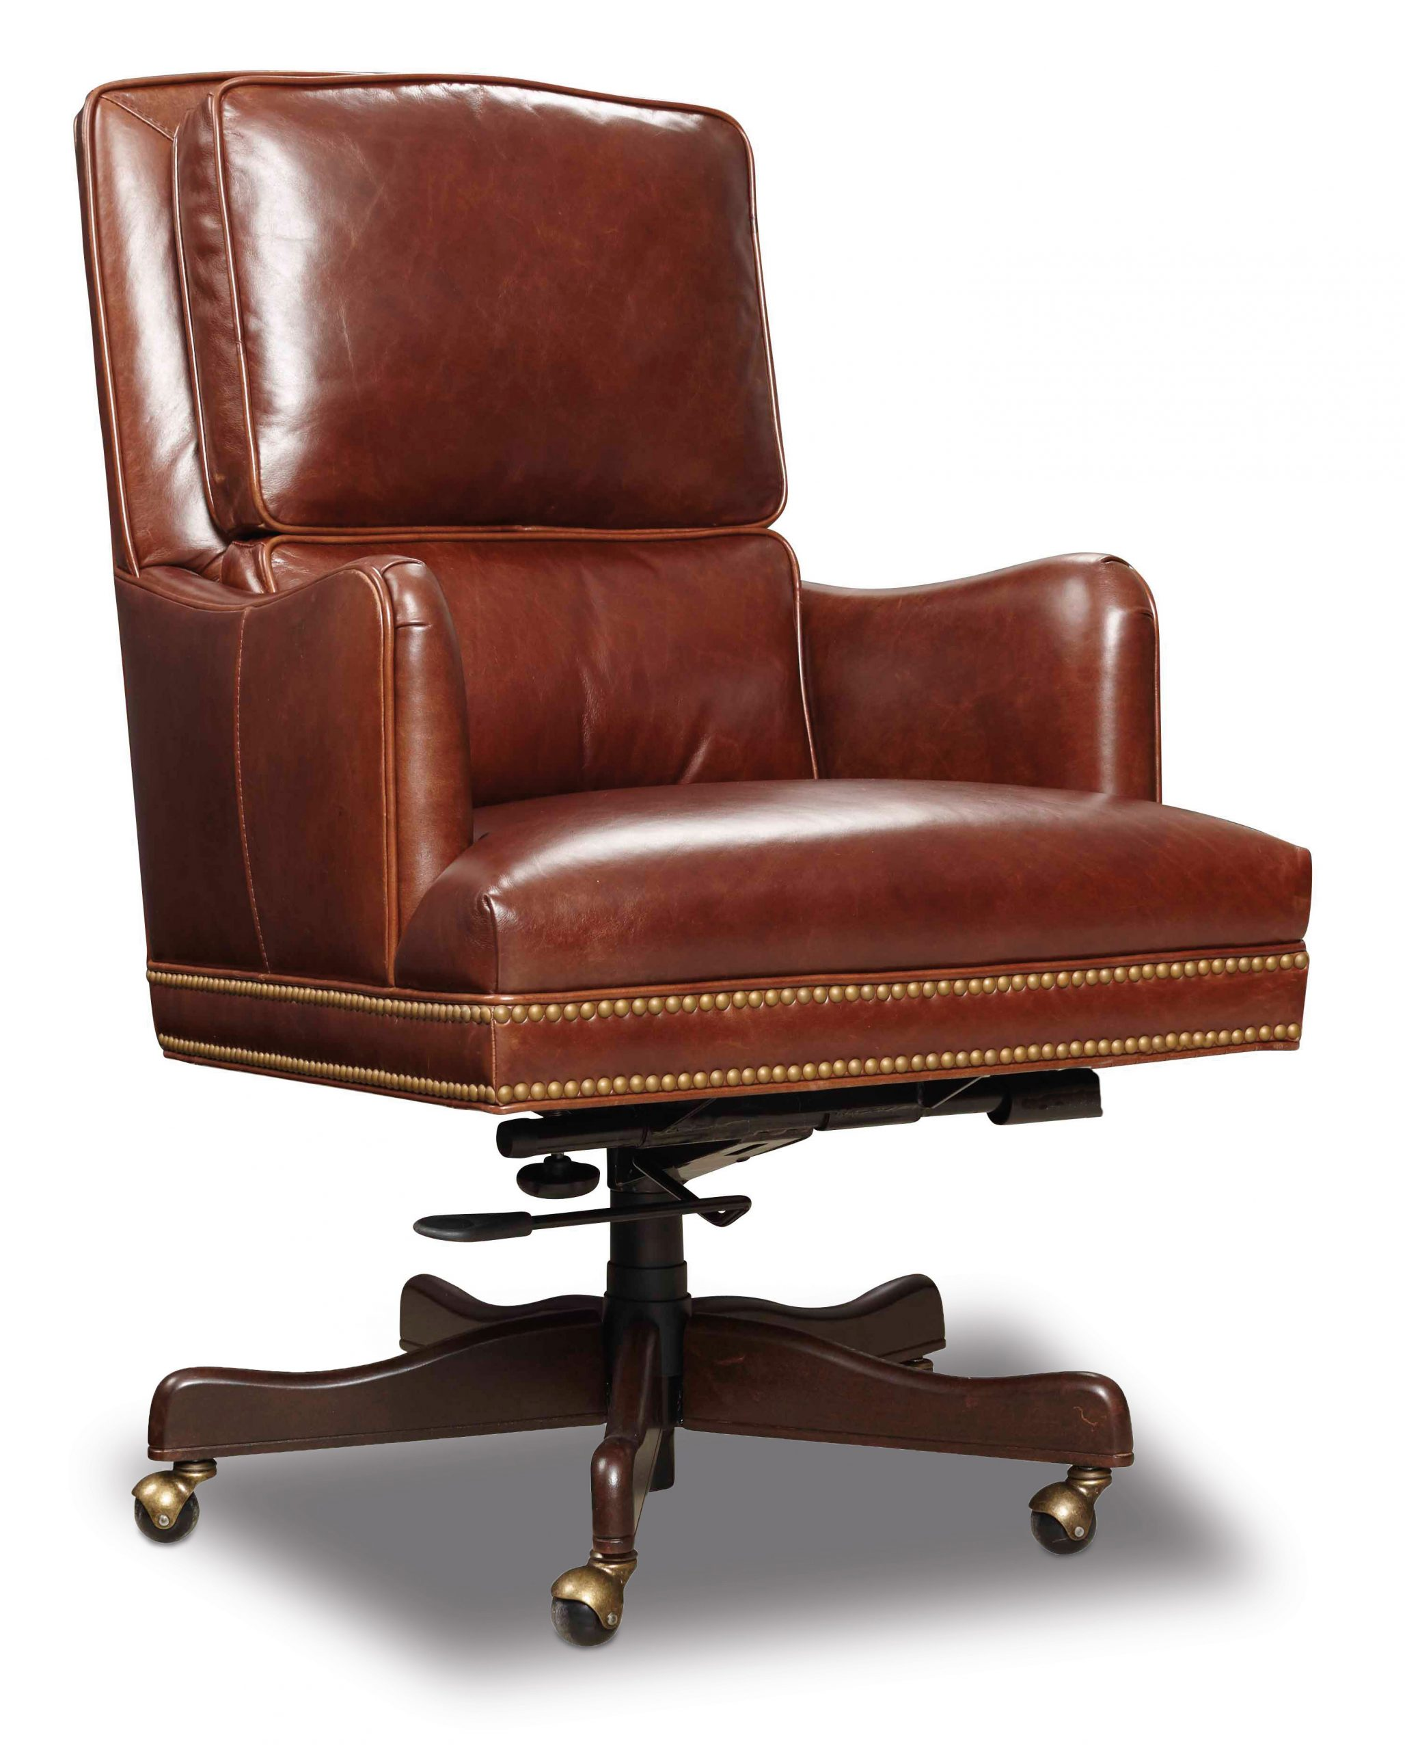 Kara Executive Swivel Tilt Chair